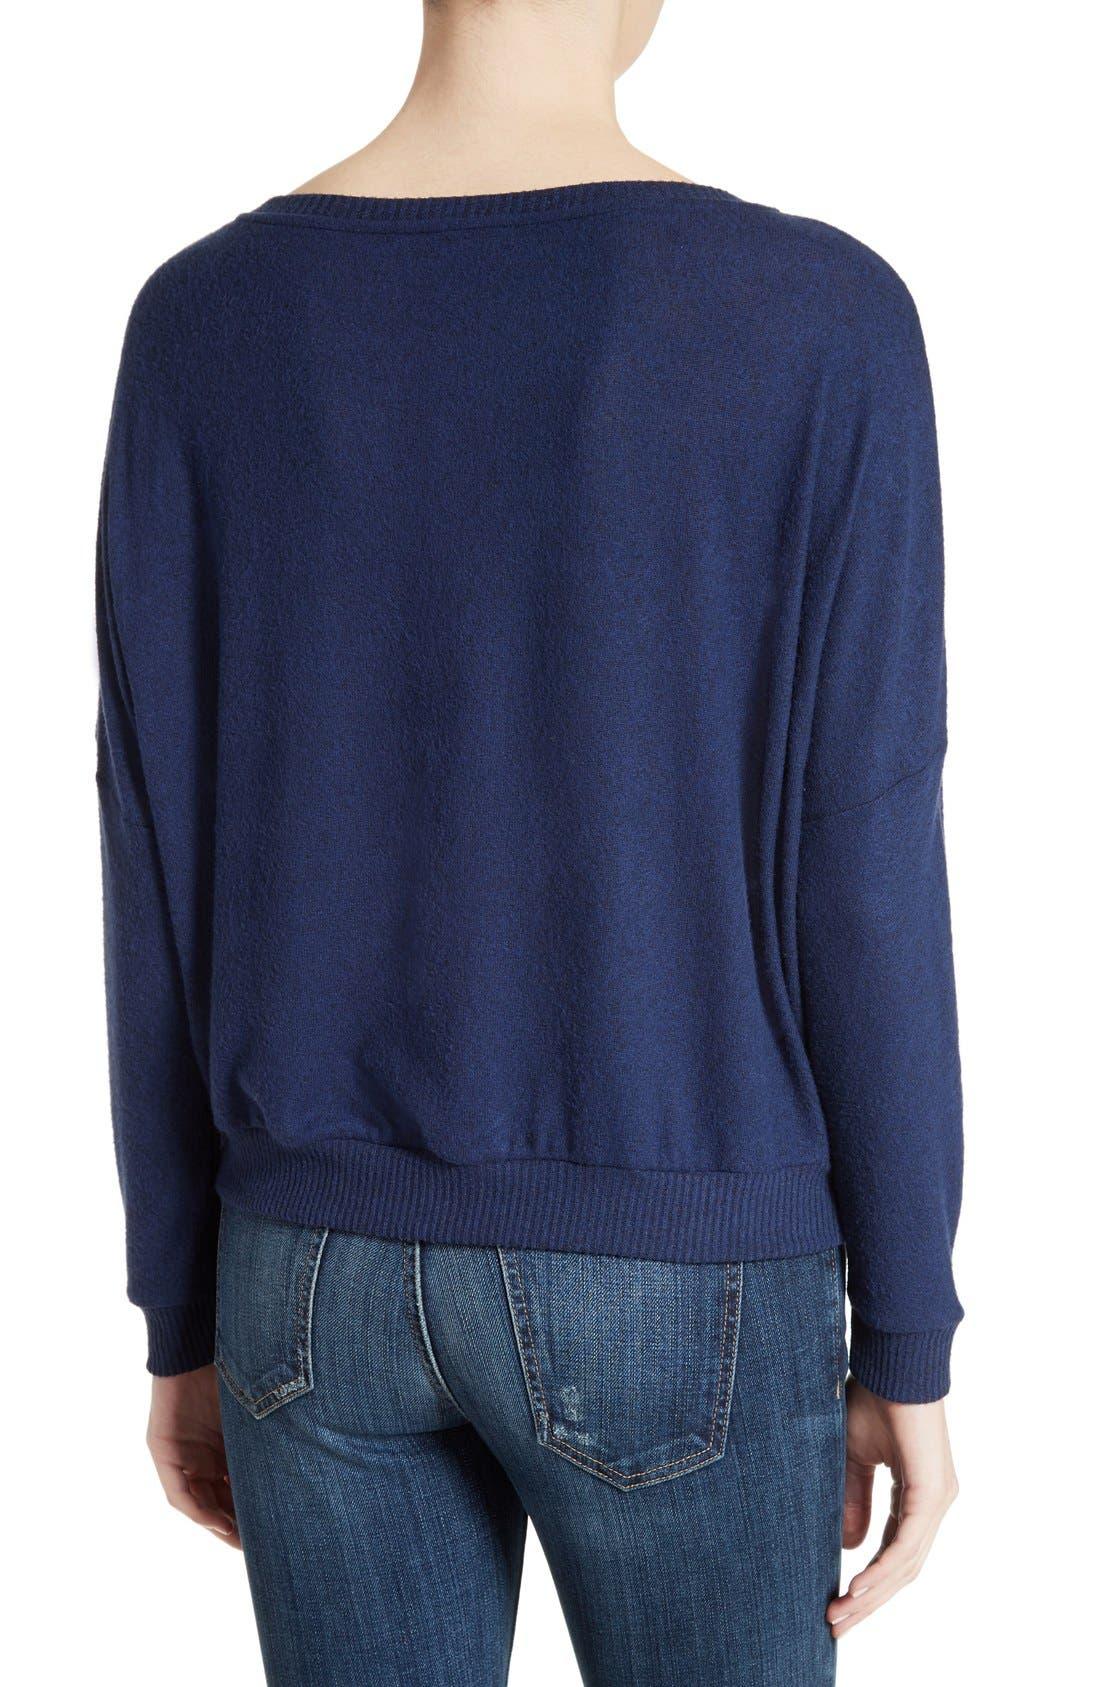 JOIE, Soft Joie Giardia Drop Shoulder Sweater, Alternate thumbnail 2, color, PEACOAT